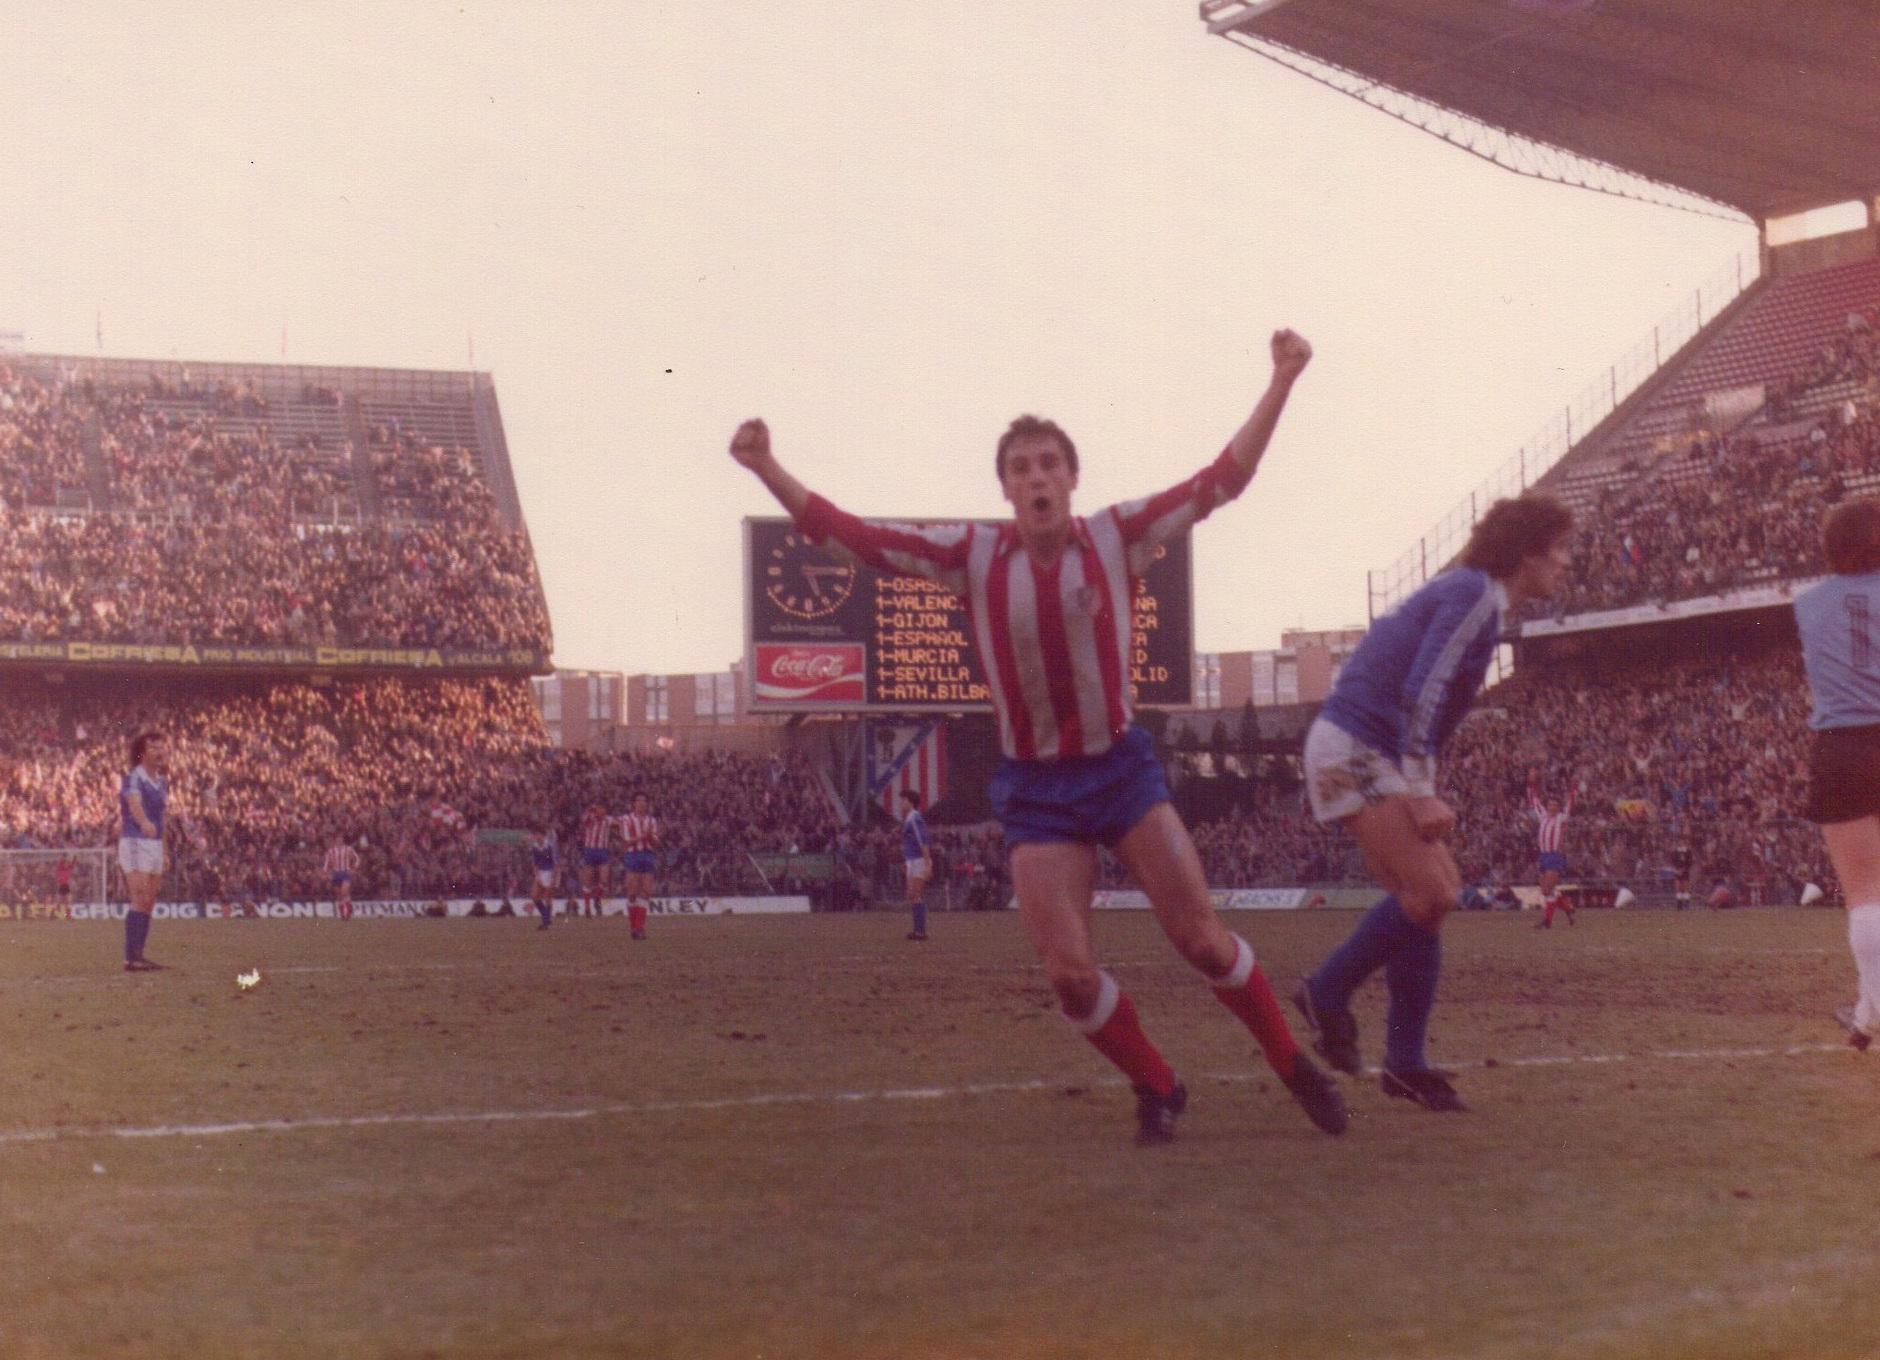 Miguel Ángel Ruiz (1977-1987) FOTO3